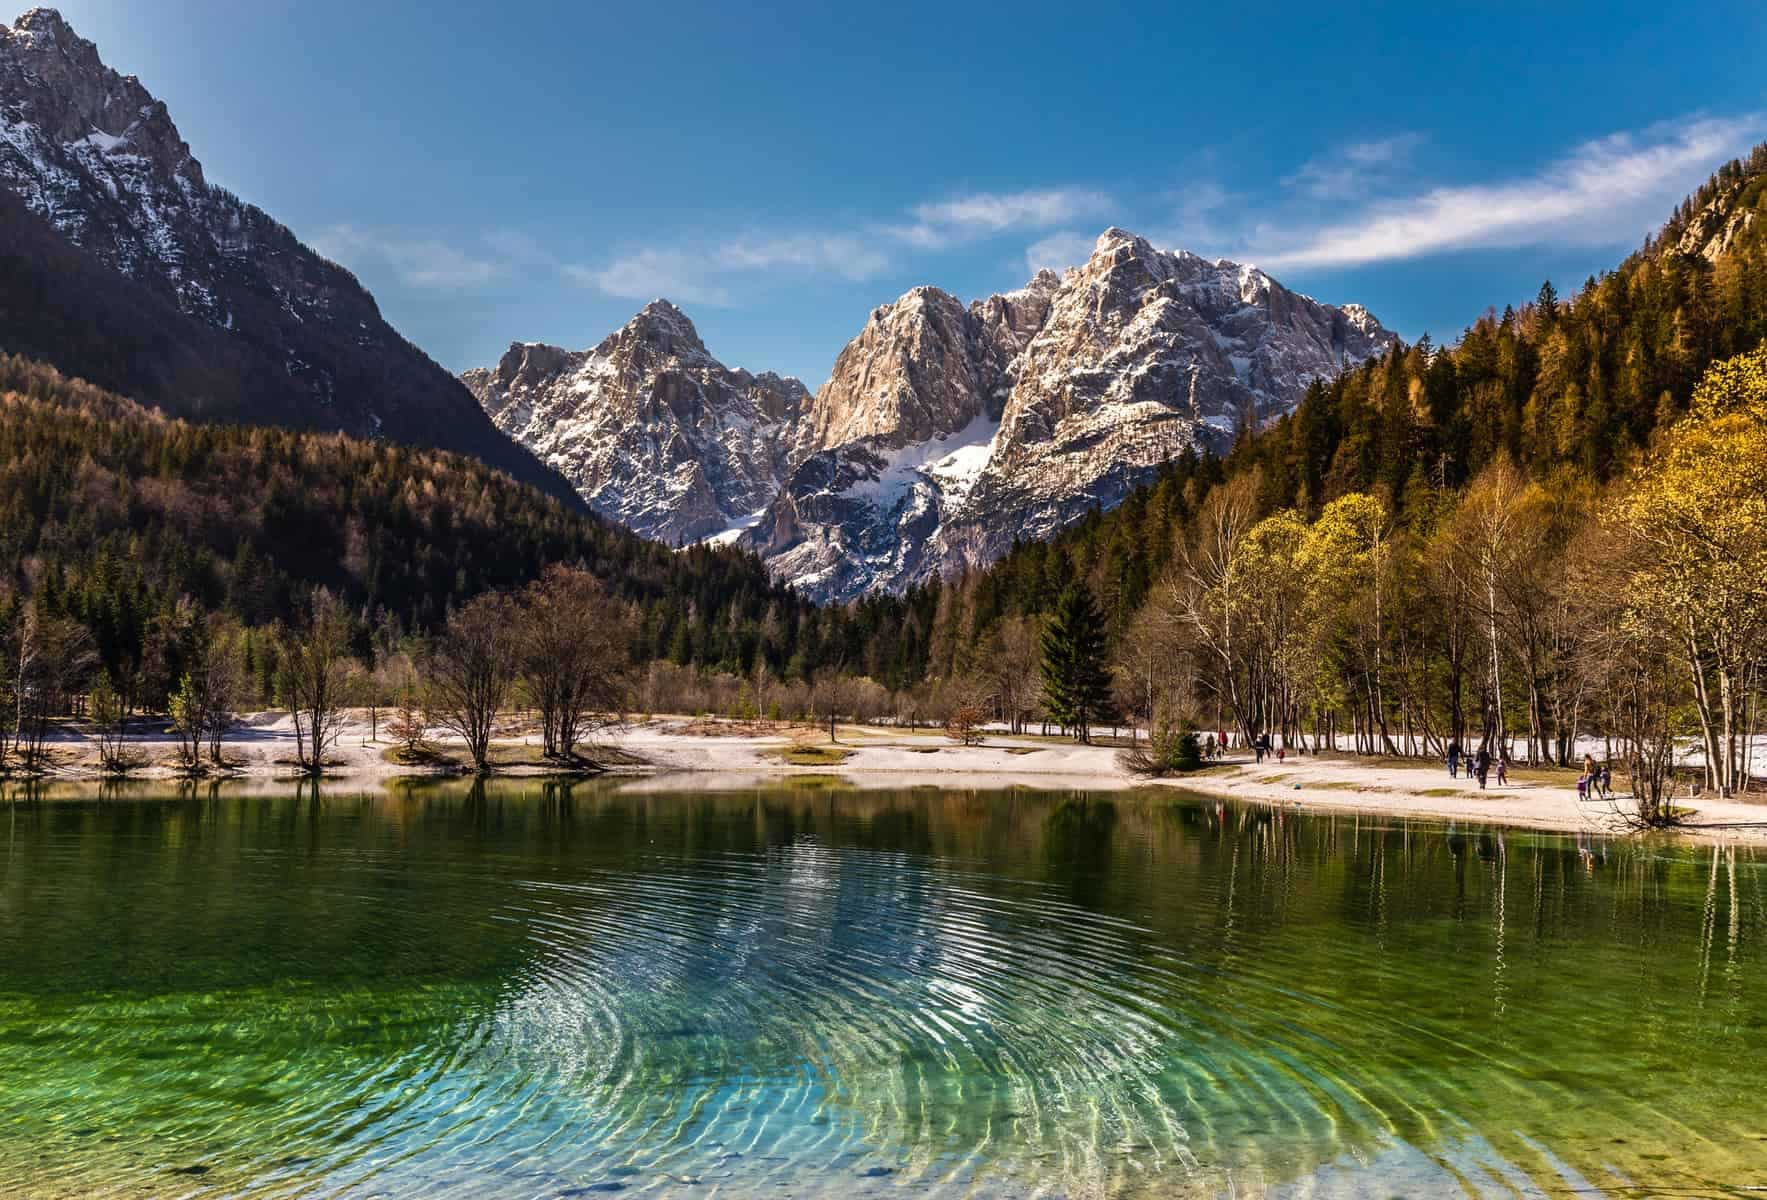 Rejser-til-slovenien: Jasna Lake,Mountain Range-Kranjska Gora, Slovenien